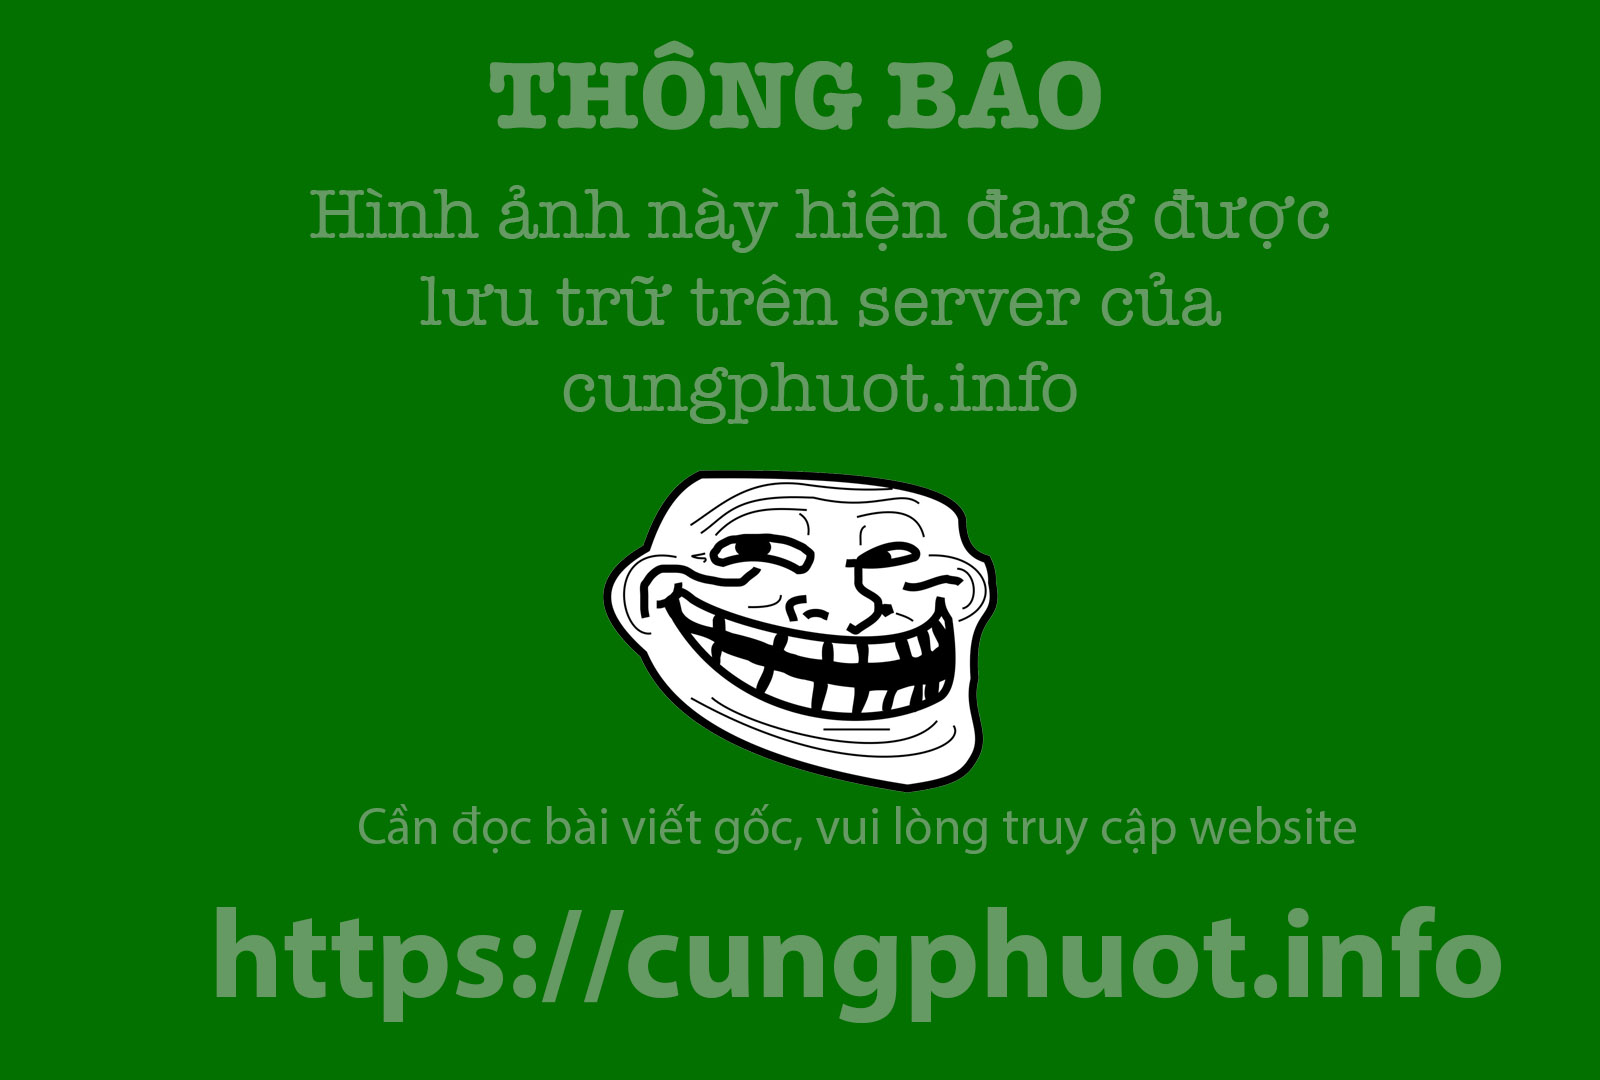 Chon bien cuong 'troi thap, dat cao' o Nam Can hinh anh 7